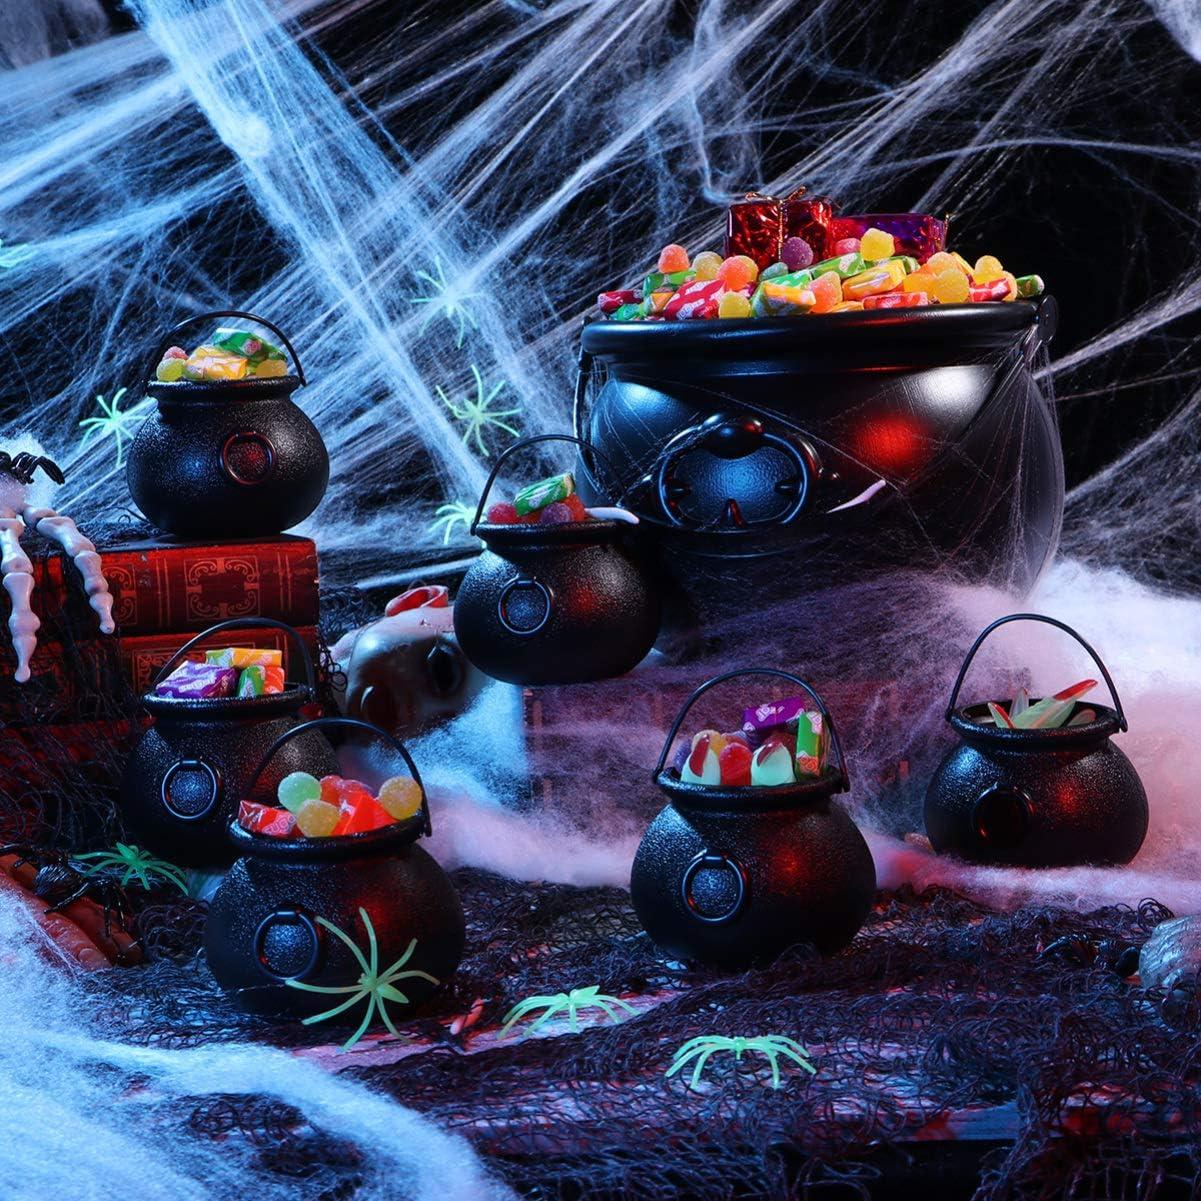 Hakka Juego de 9 Calderos Port/átil Cubo de Caramelo con Mango Negro Caldero de Bruja para Caramelos Dulces de Fiestas Halloween Decoracion